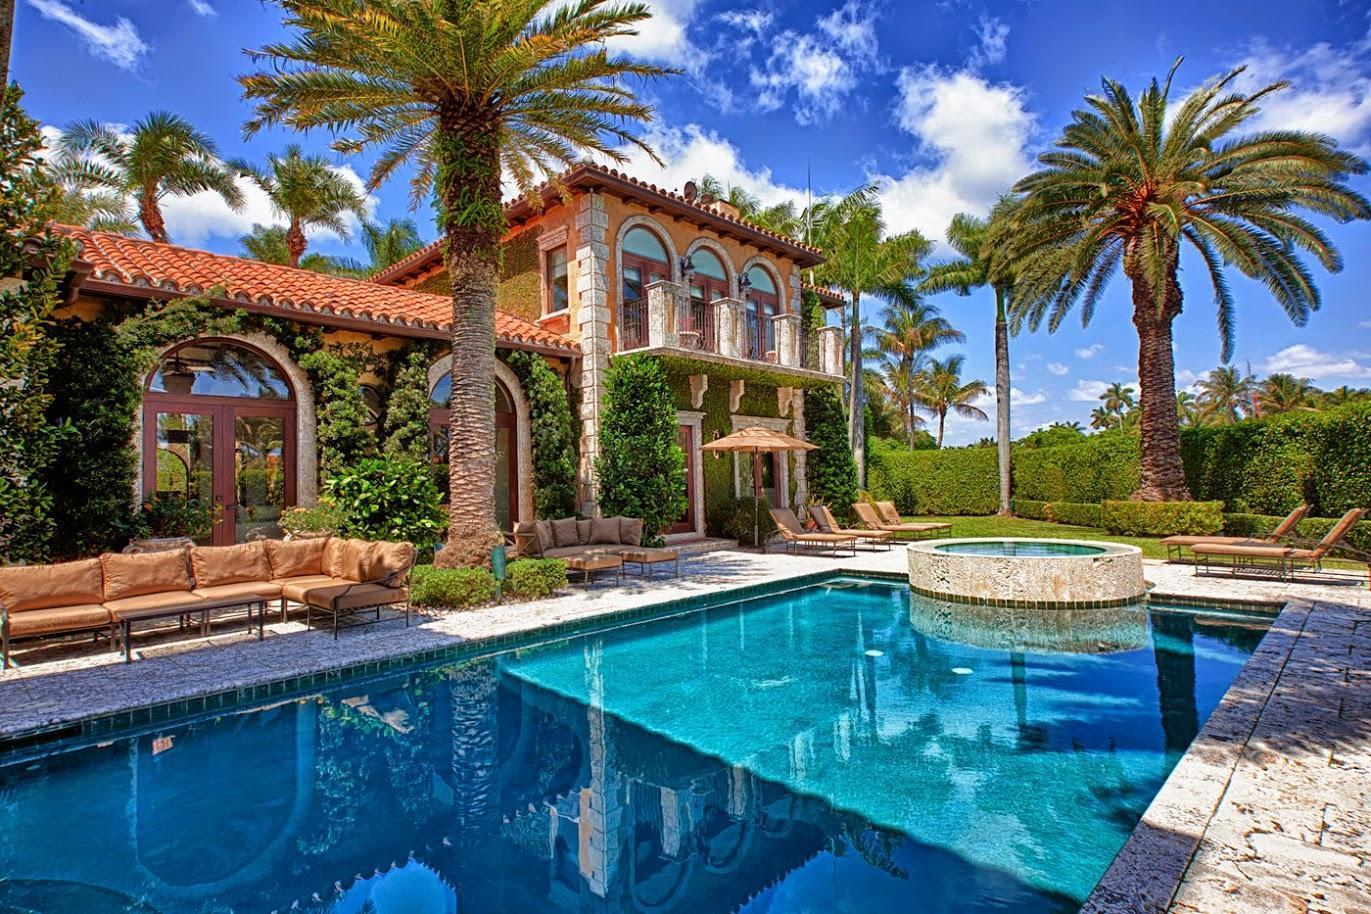 laguna cove at ocotillo homes for sale chandler az laguna cove real estate chandler az